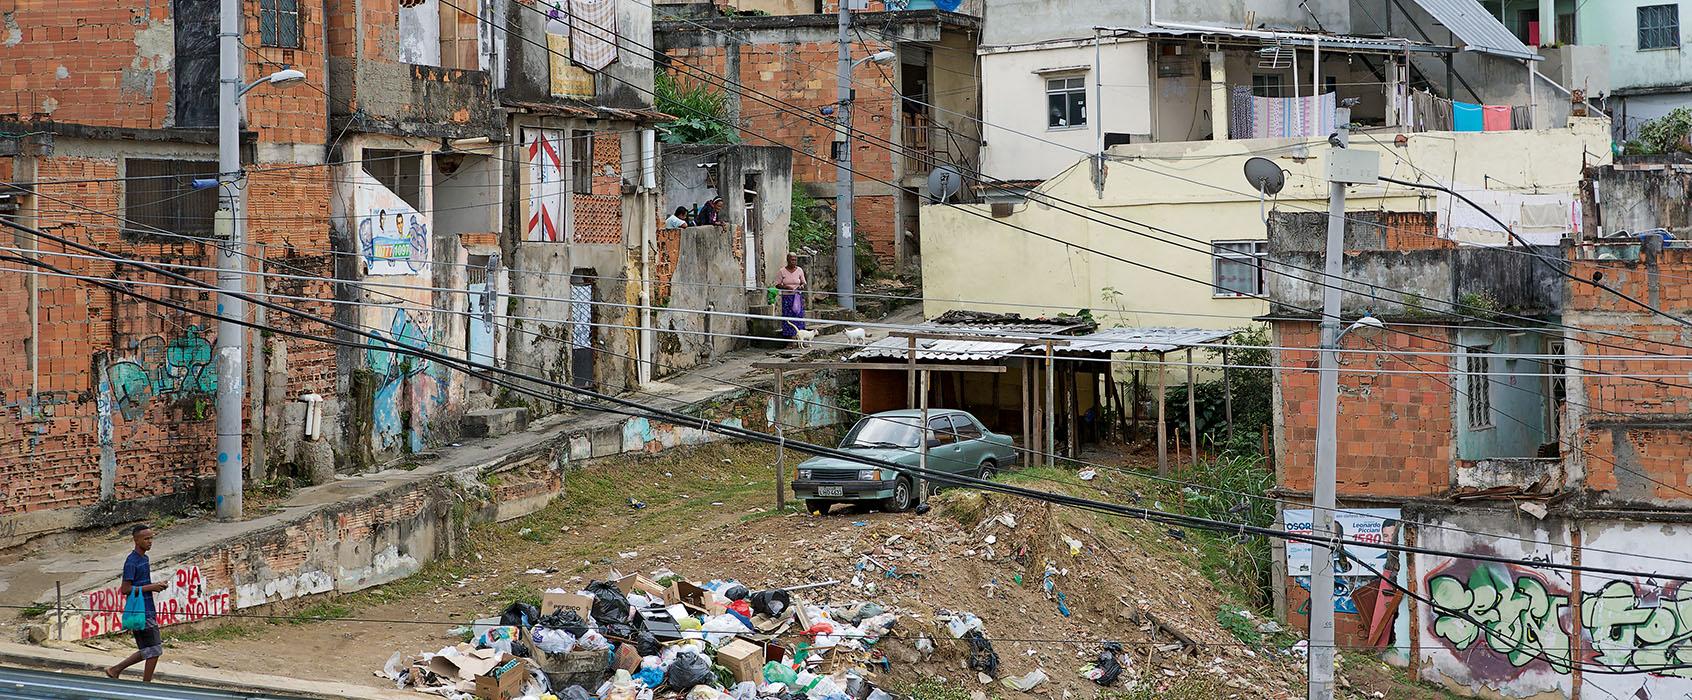 mvg_Rio_#14_Favela_ground